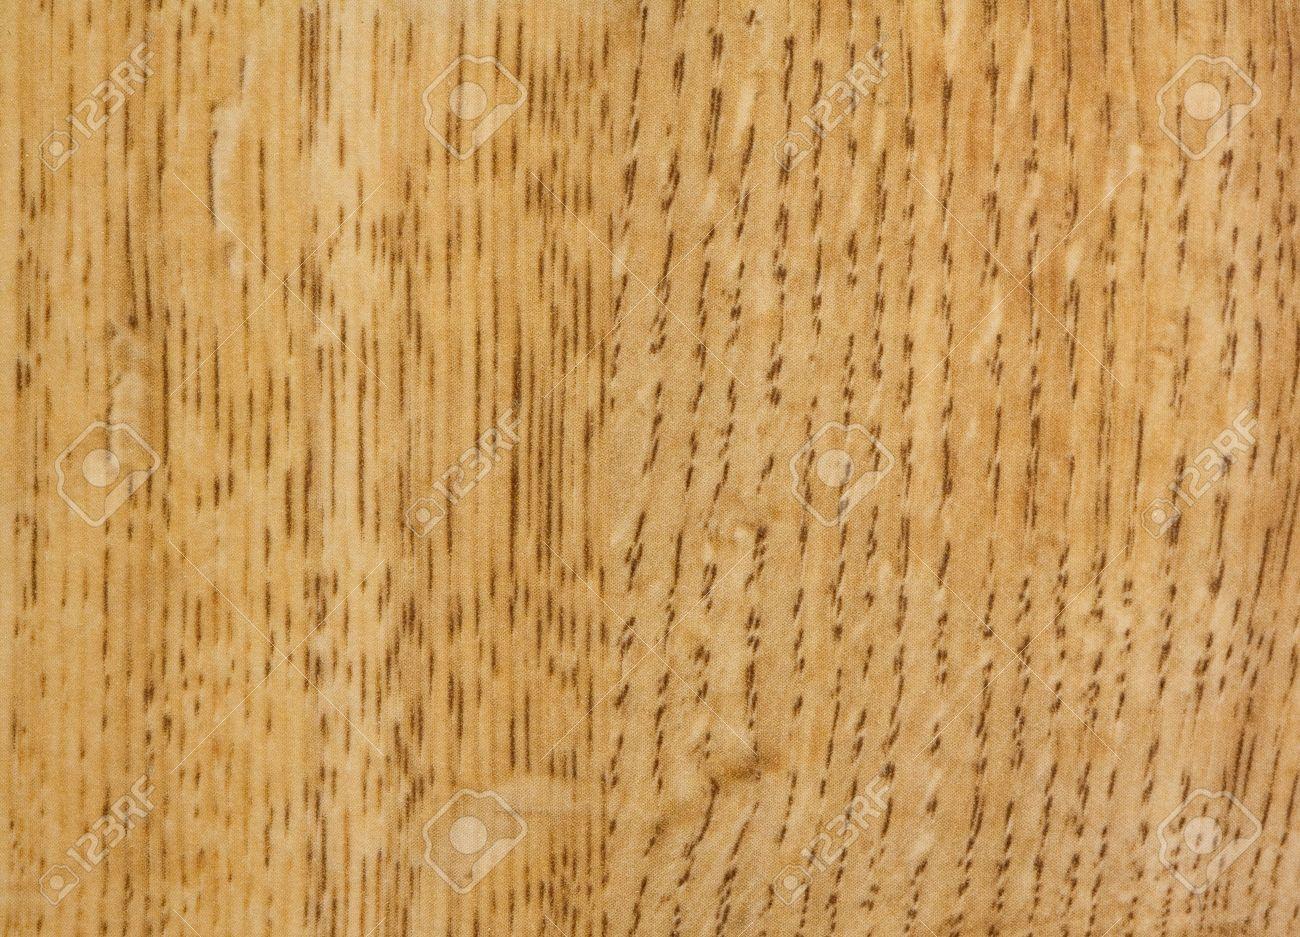 oak formica wood grain